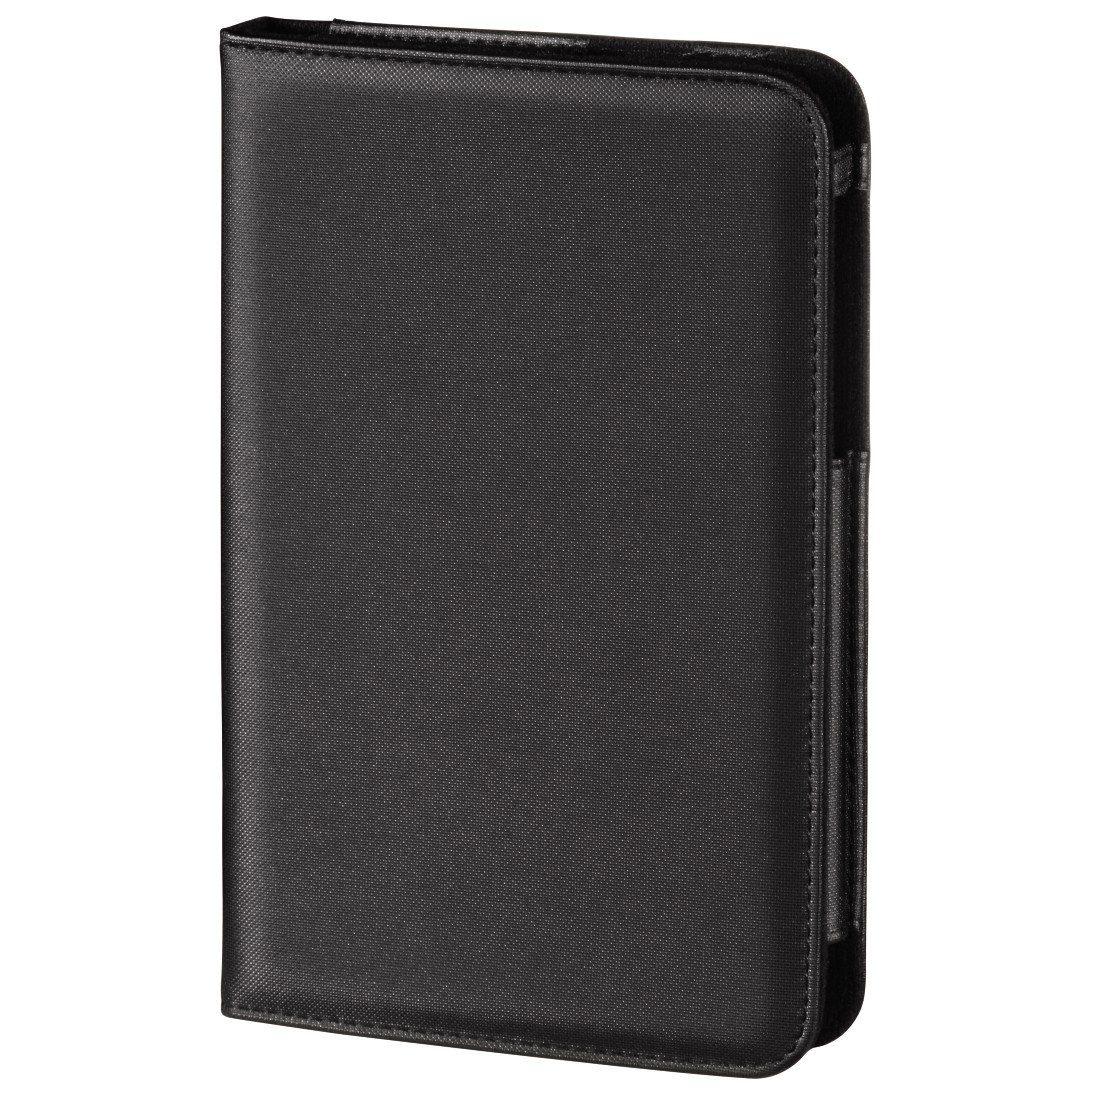 Hama Hülle Tasche f. Samsung Galaxy Tab E 9.6 Tablet Schutzhülle »Case Cover Etui«